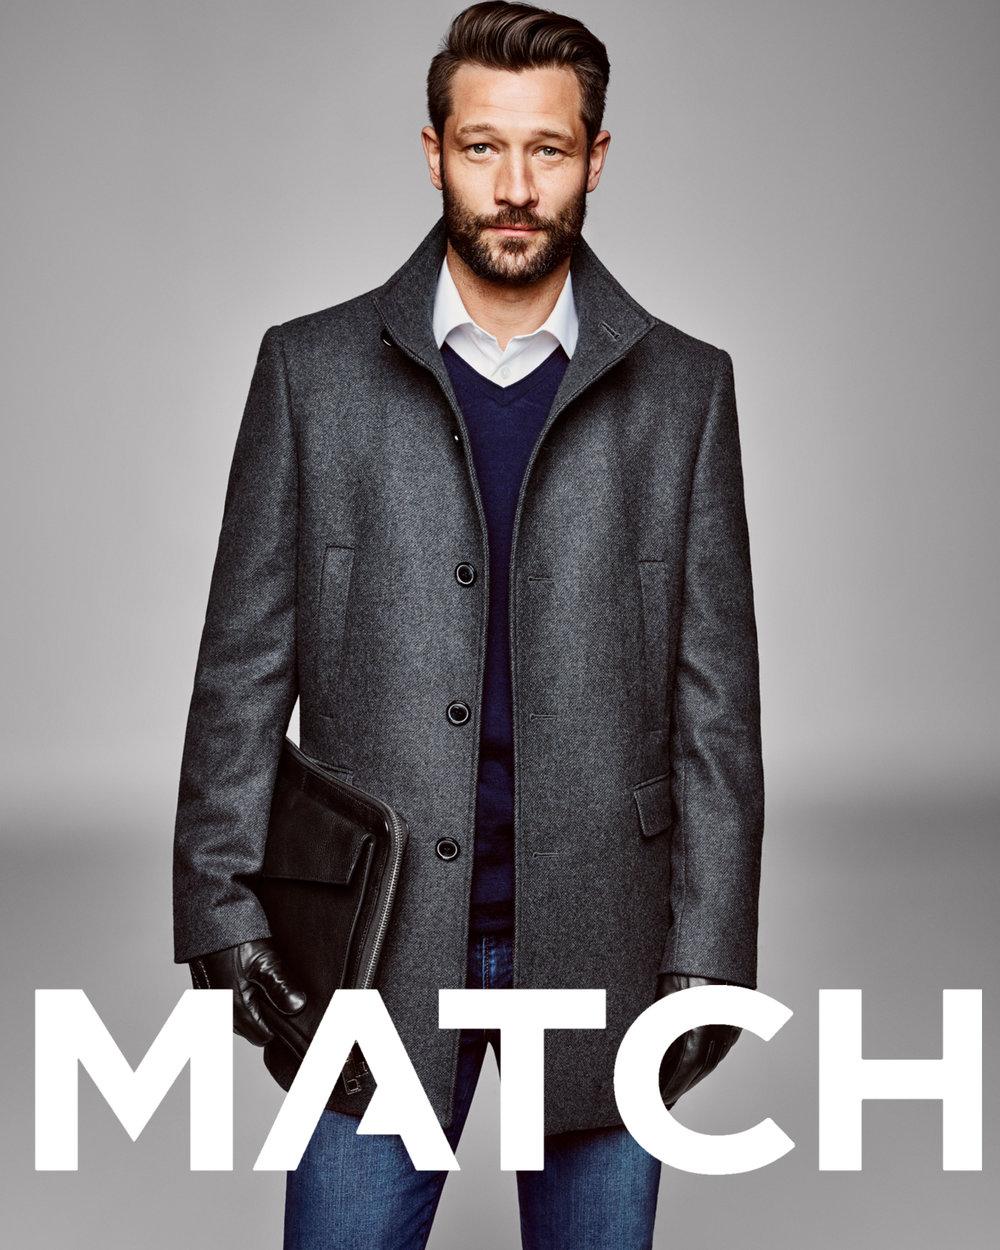 match118.jpg